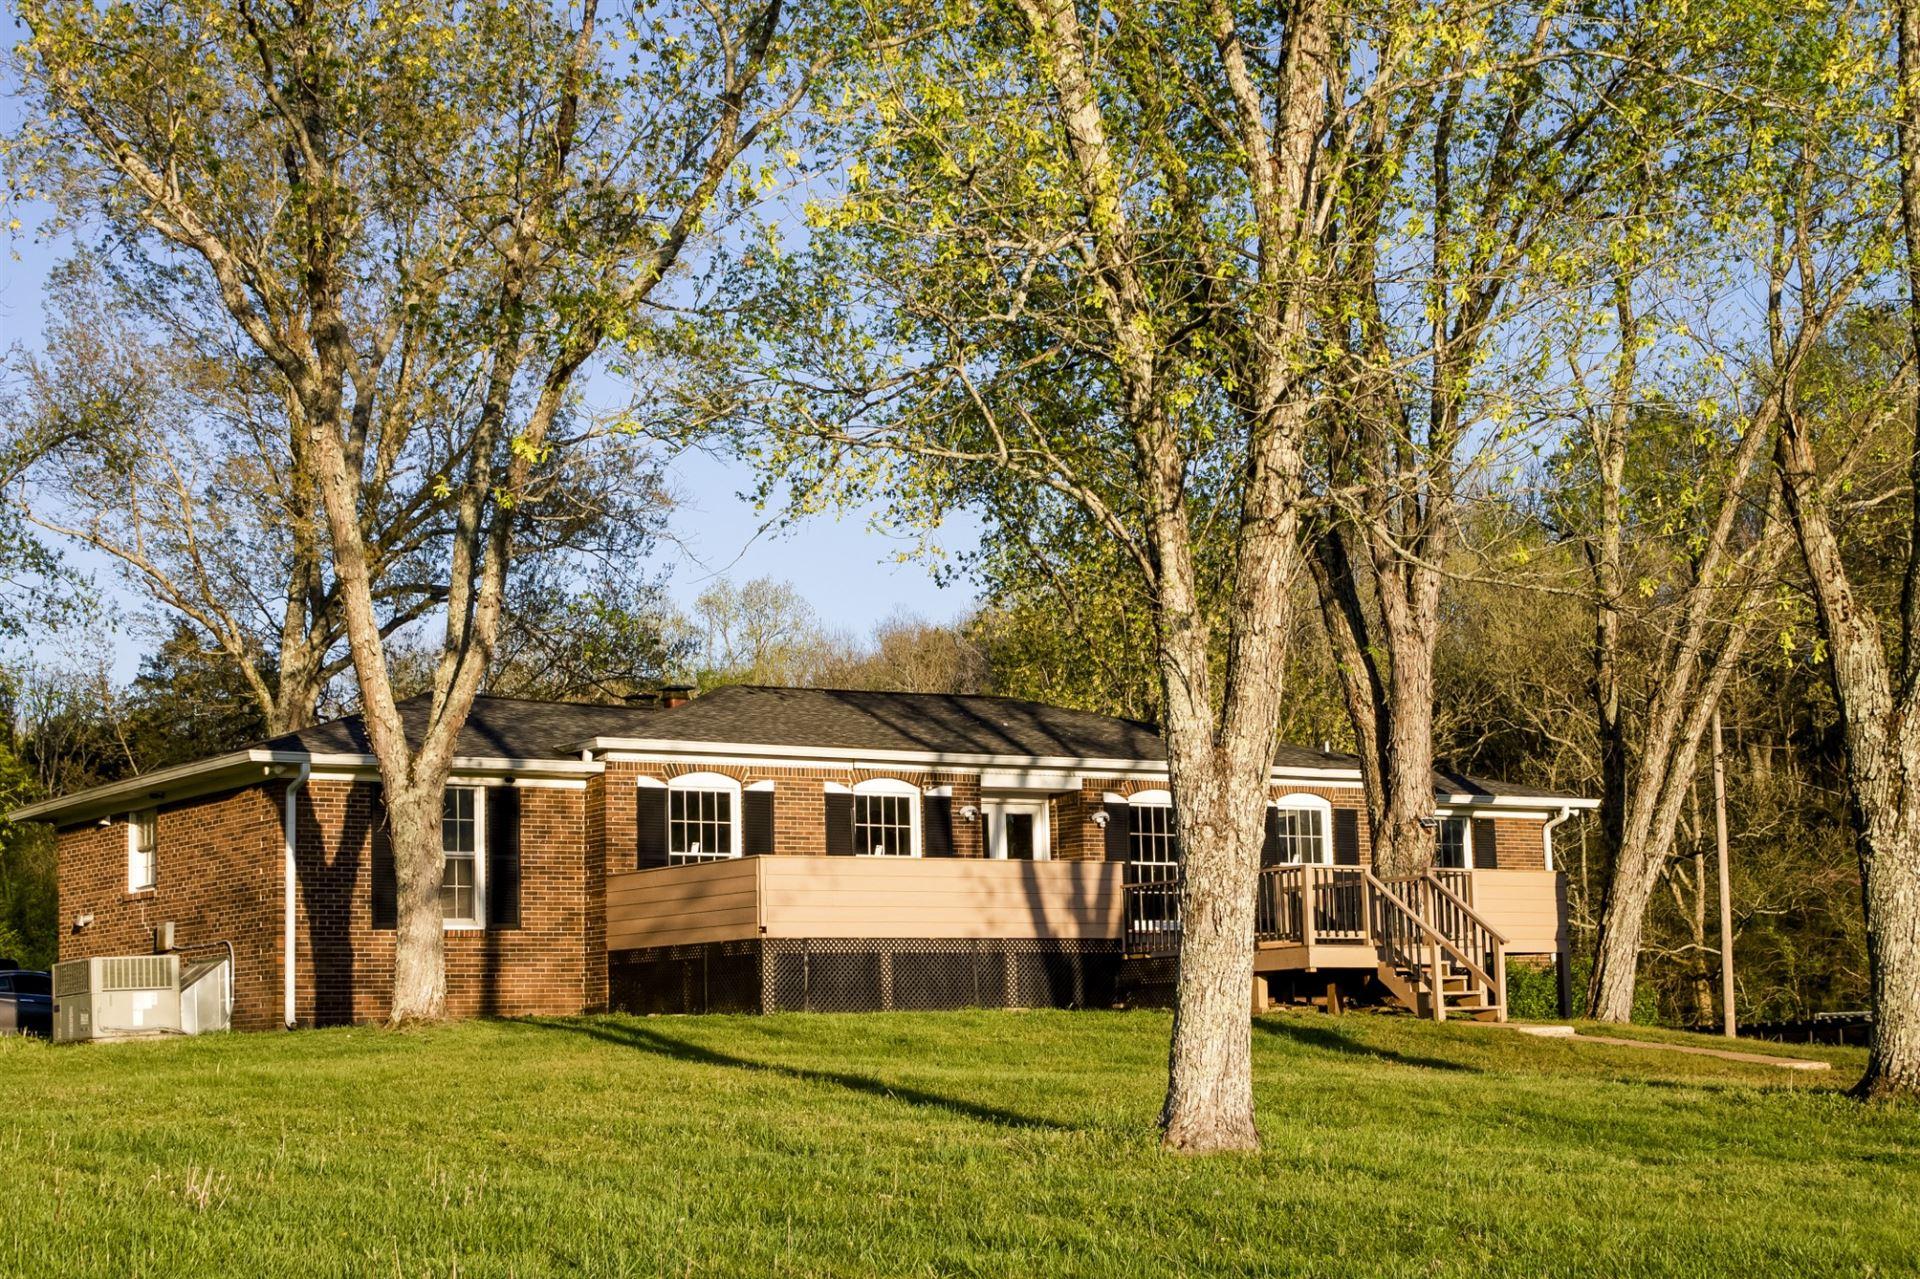 5820 Cane Ridge Rd, Antioch, TN 37013 - MLS#: 2237664